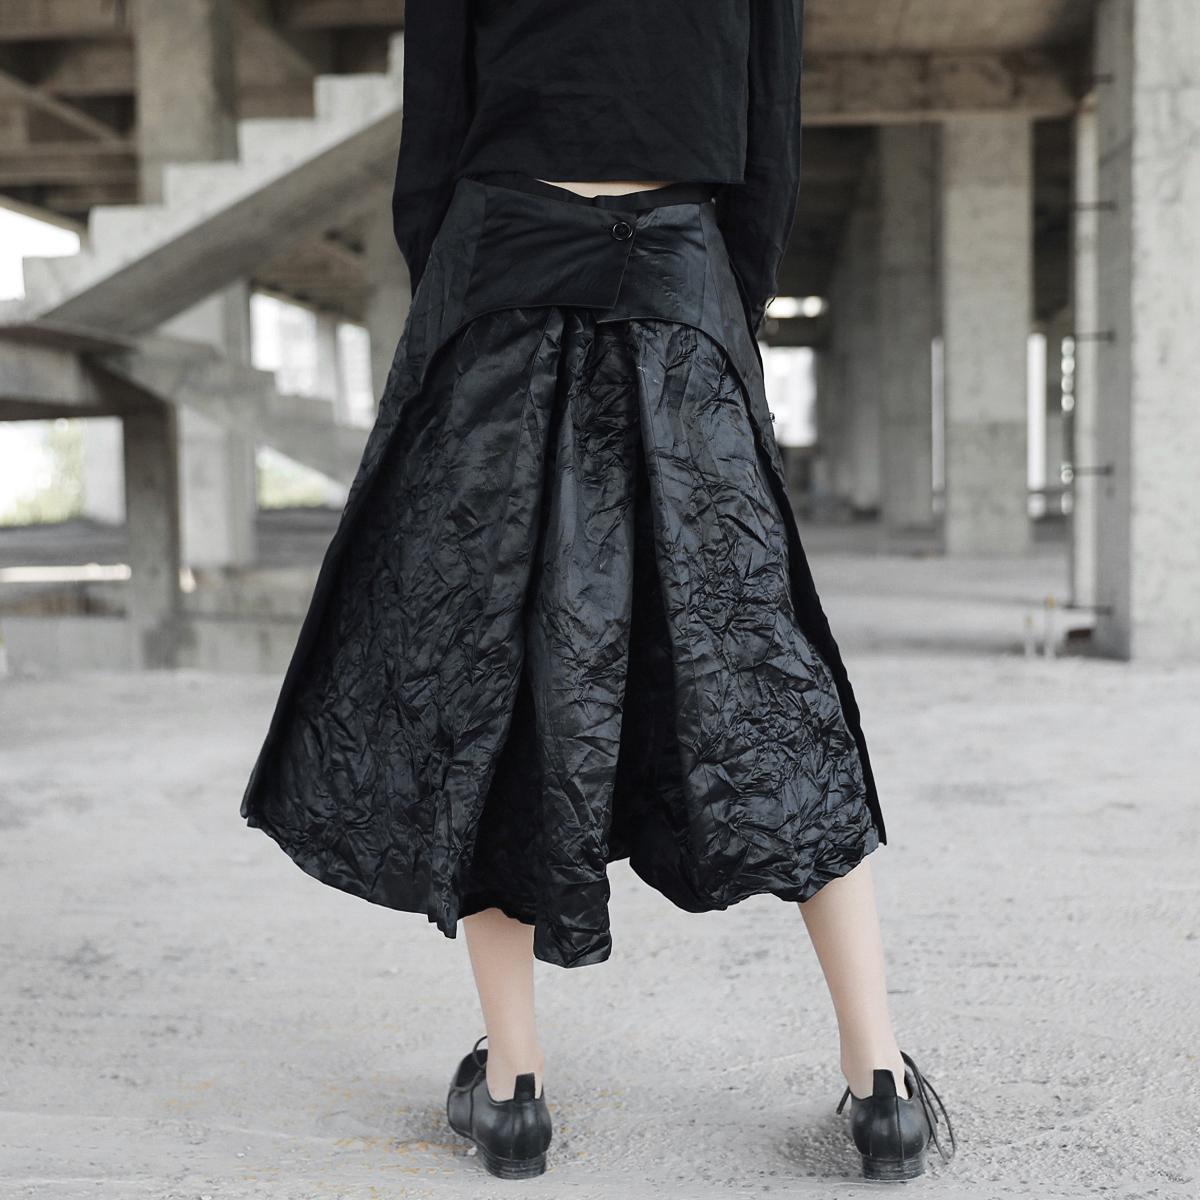 SIMPLE BLACK 秋冬暗黑ED先锋褶皱中长款不规则半身小黑裙蓬蓬裙